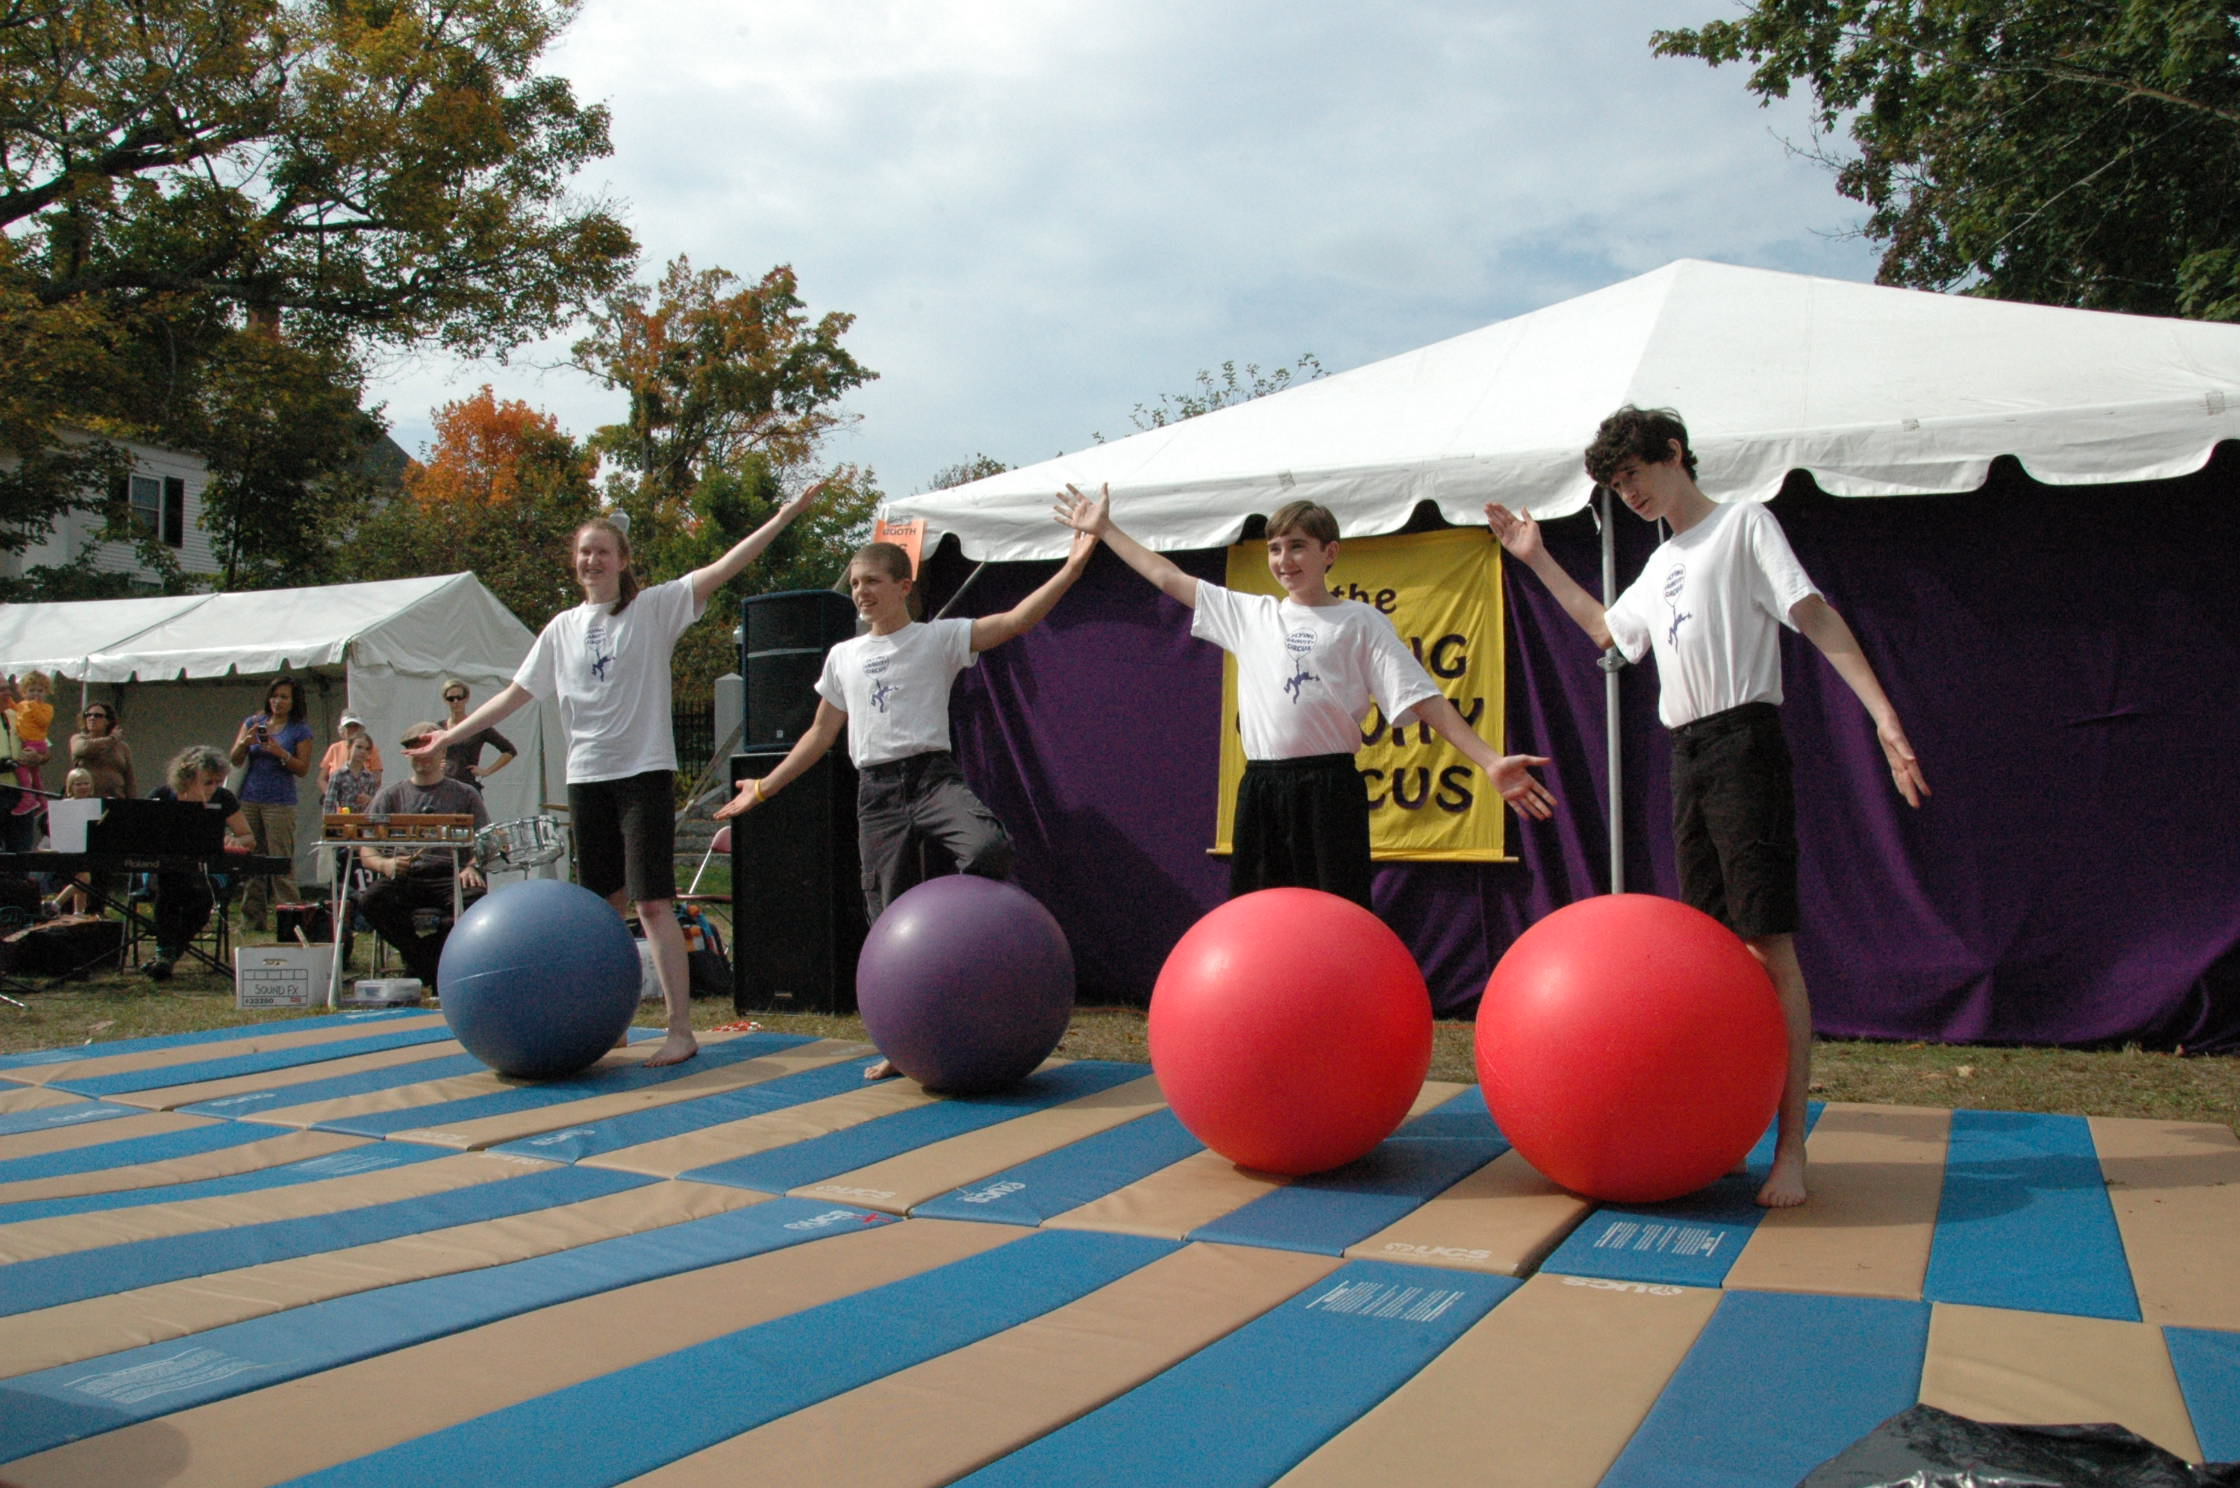 2012-10-06 Flyin Gravity Circus - Pumpkin 081.JPG